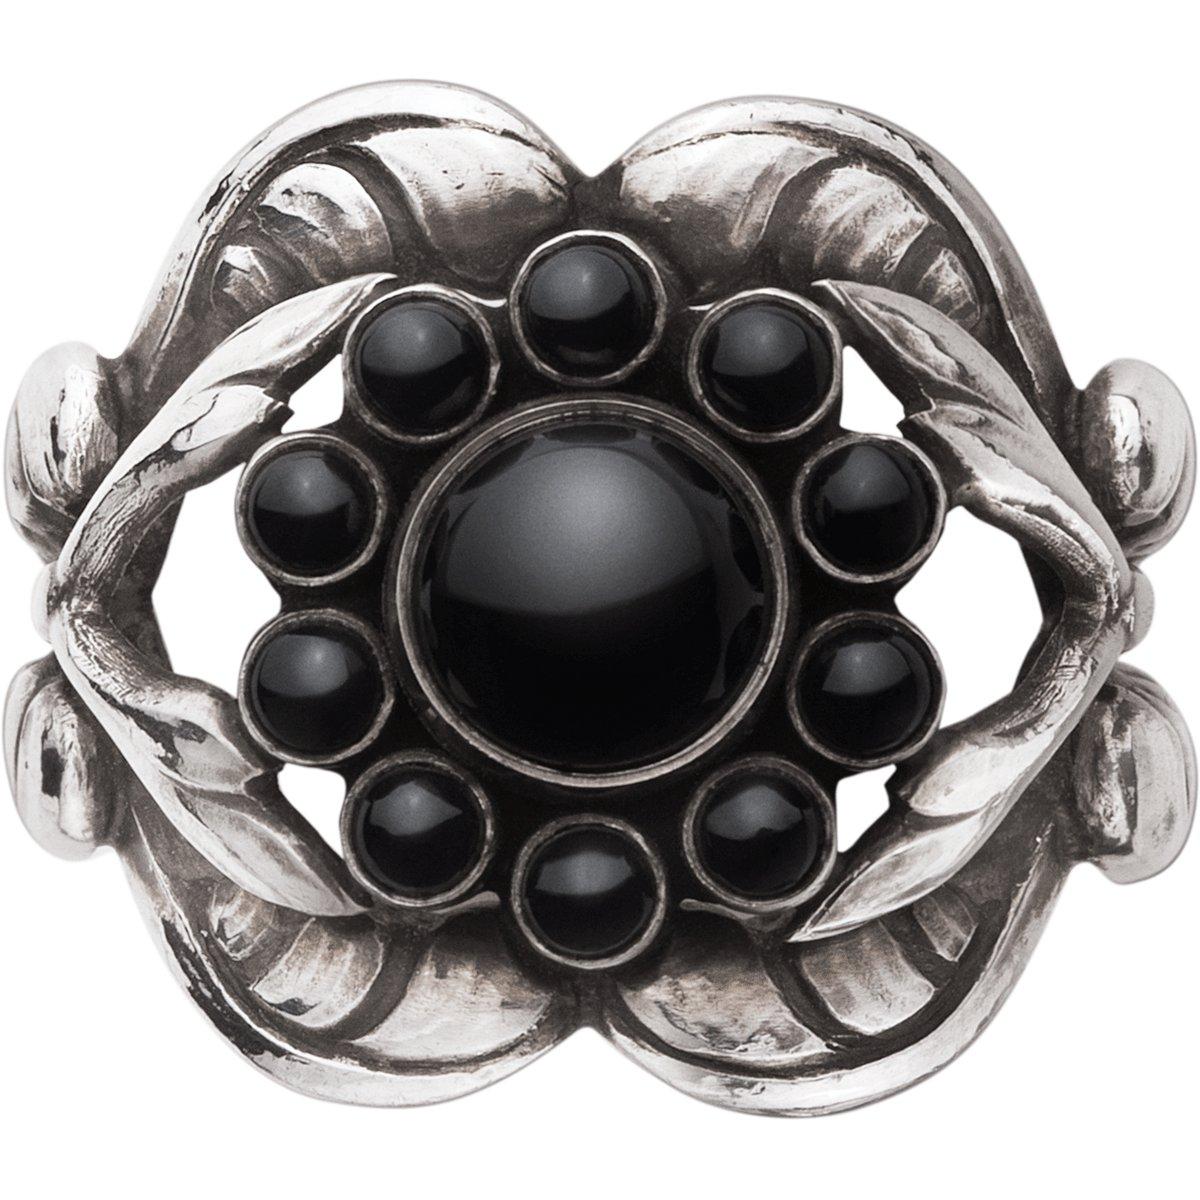 Moonlight Blossom Ring , Sort Agate